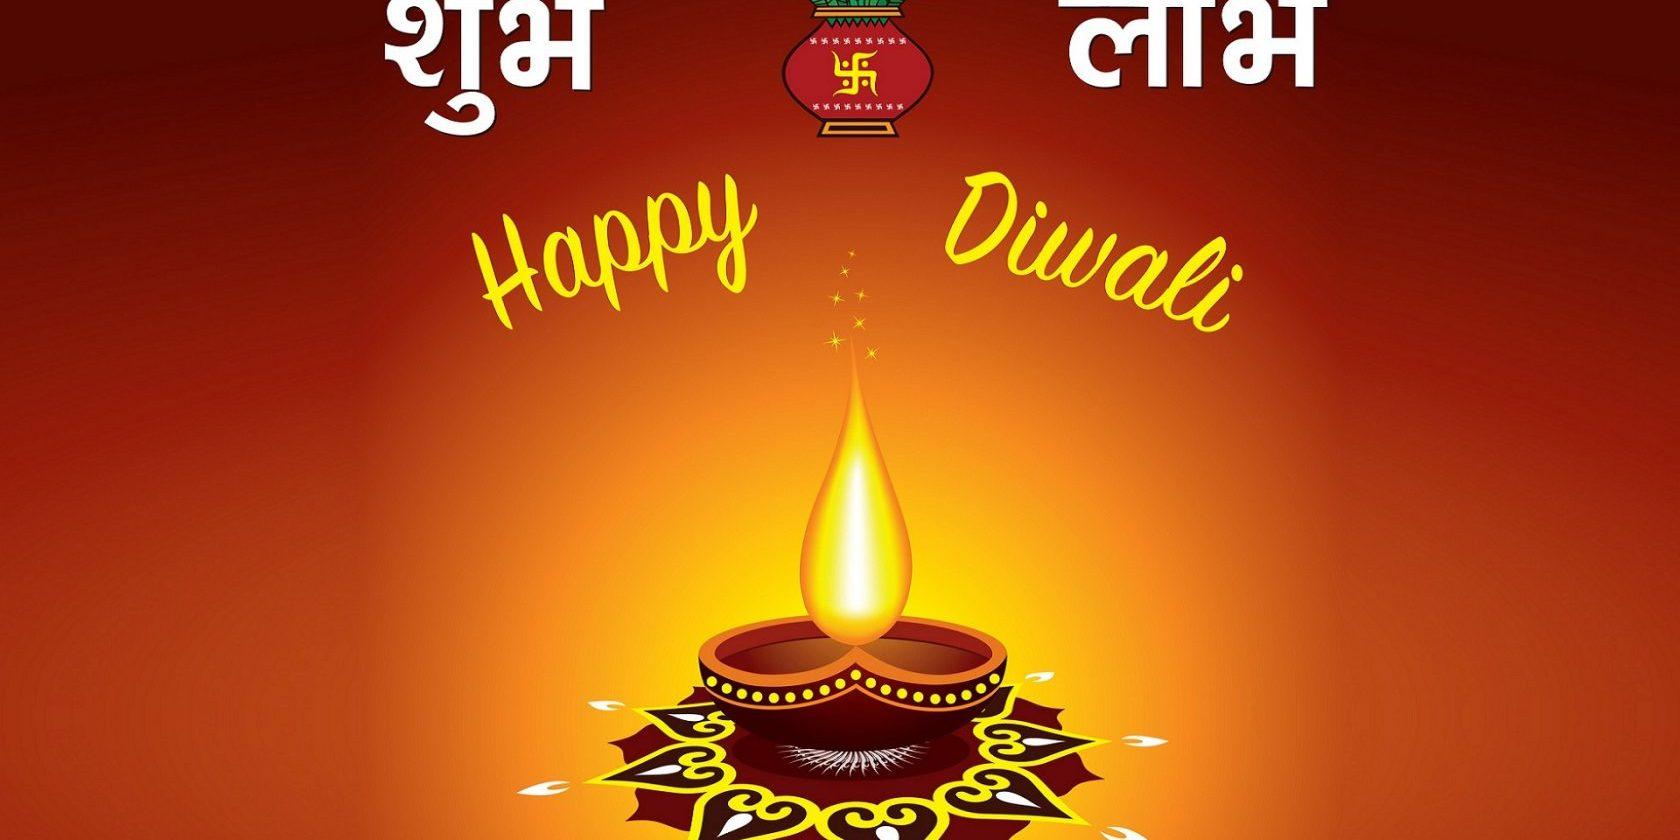 Deepavali The Festival Of Lights Financial Enlightenment